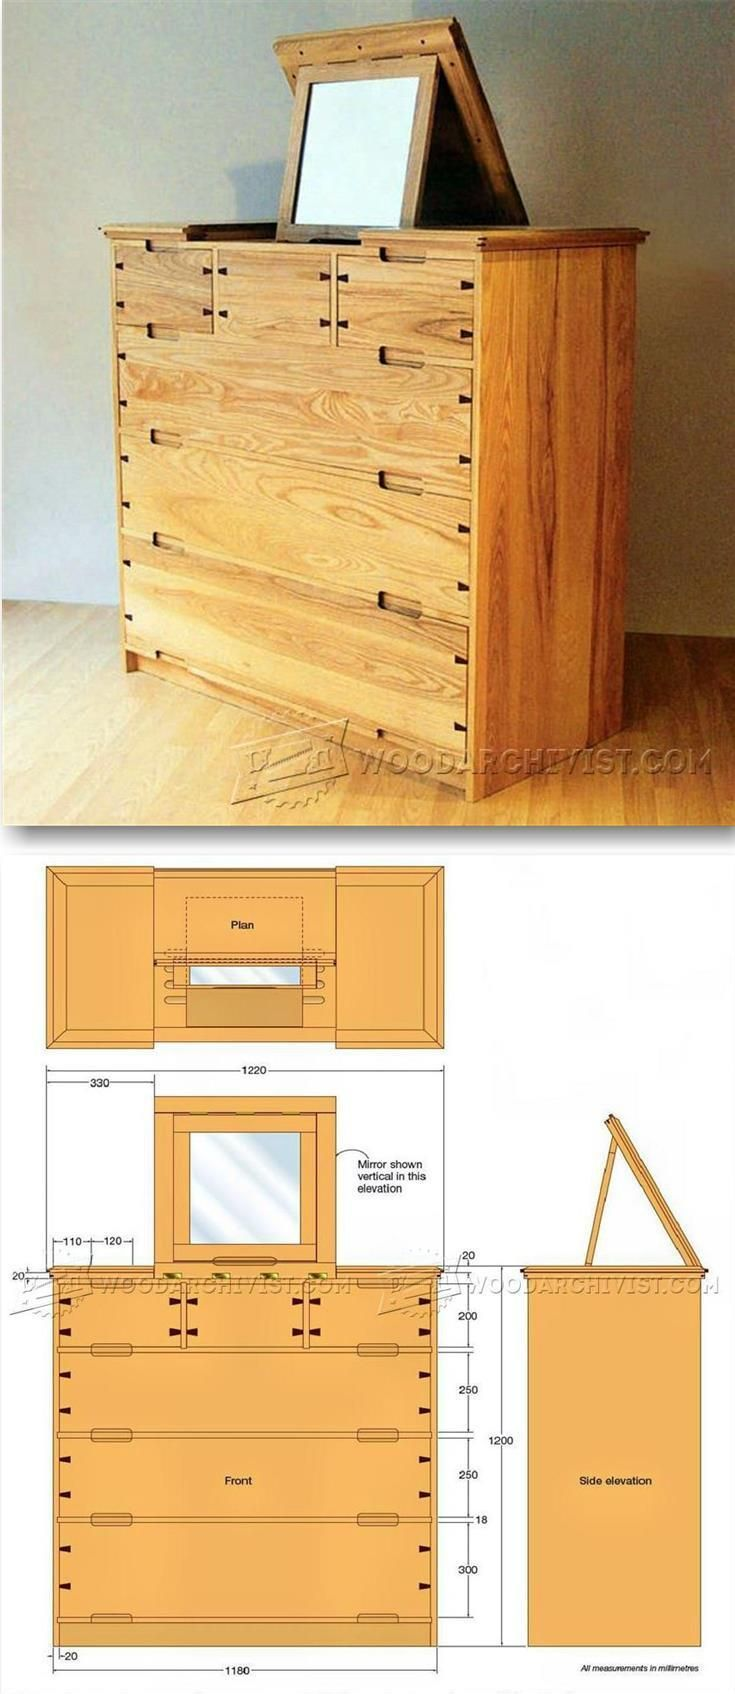 Bat house plans woodwork city free woodworking plans - Dressing Chest Plans Furniture Plans And Projects Woodarchivist Com